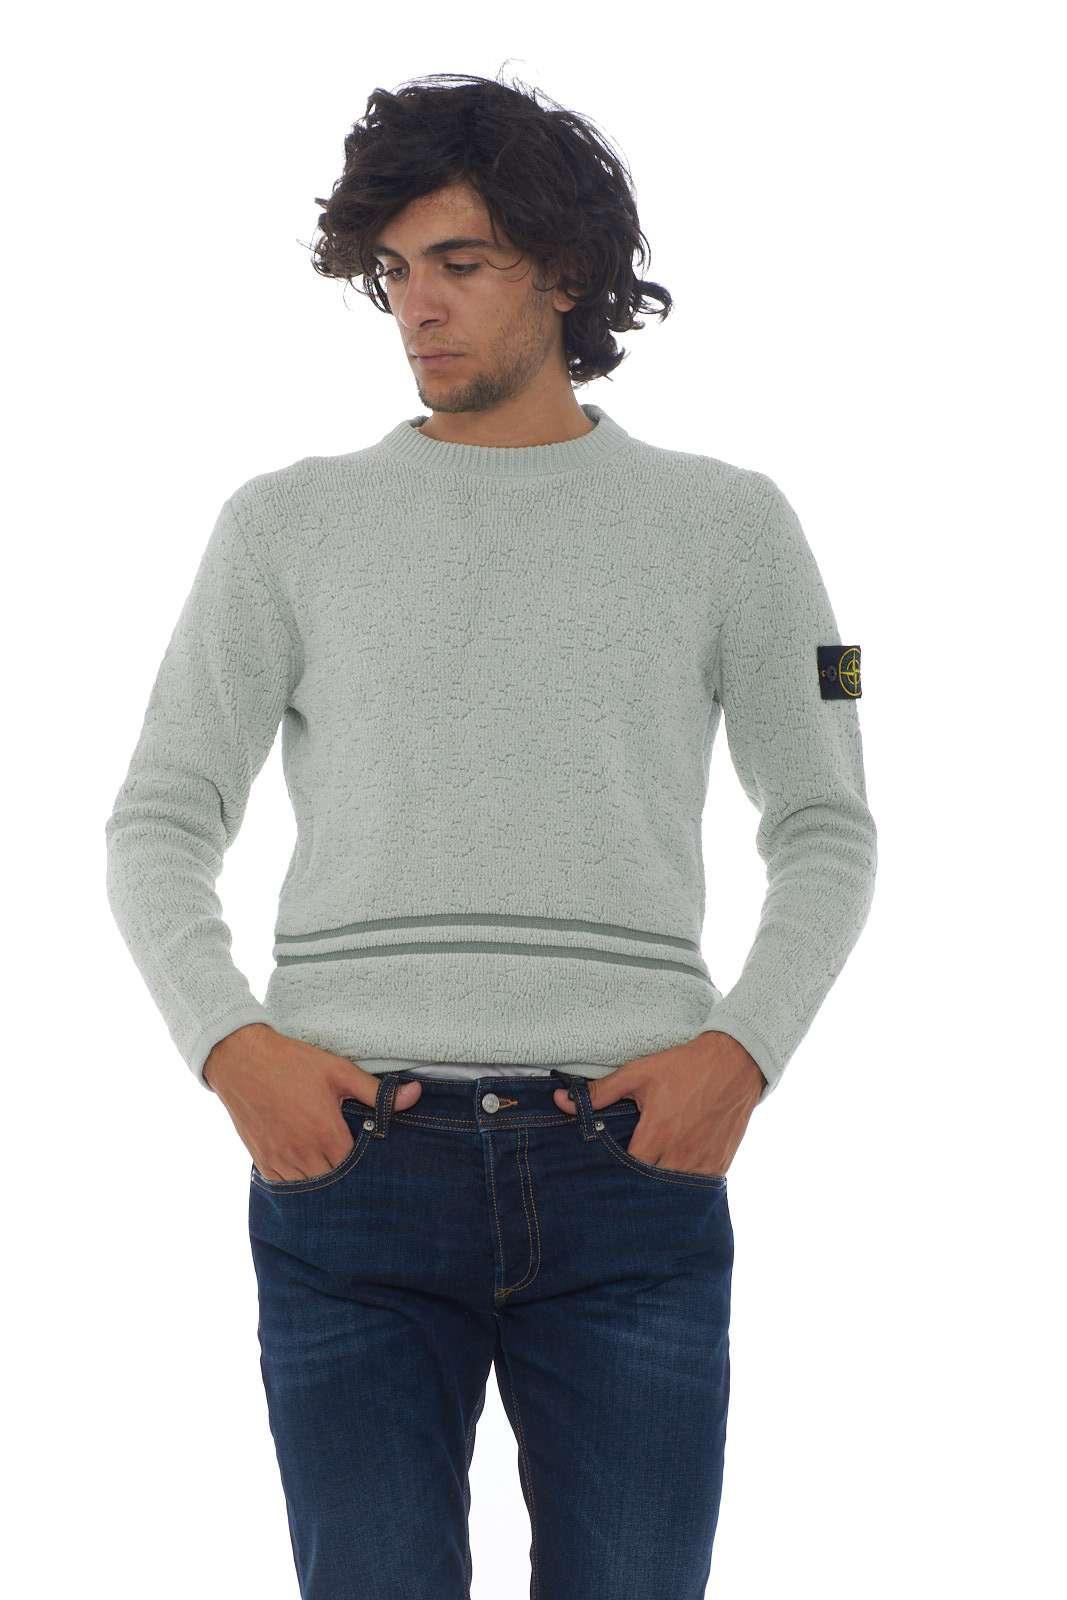 https://www.parmax.com/media/catalog/product/a/i/AI-outlet_parmax-maglia-uomo-Stone-Island-7115517B1-A.jpg